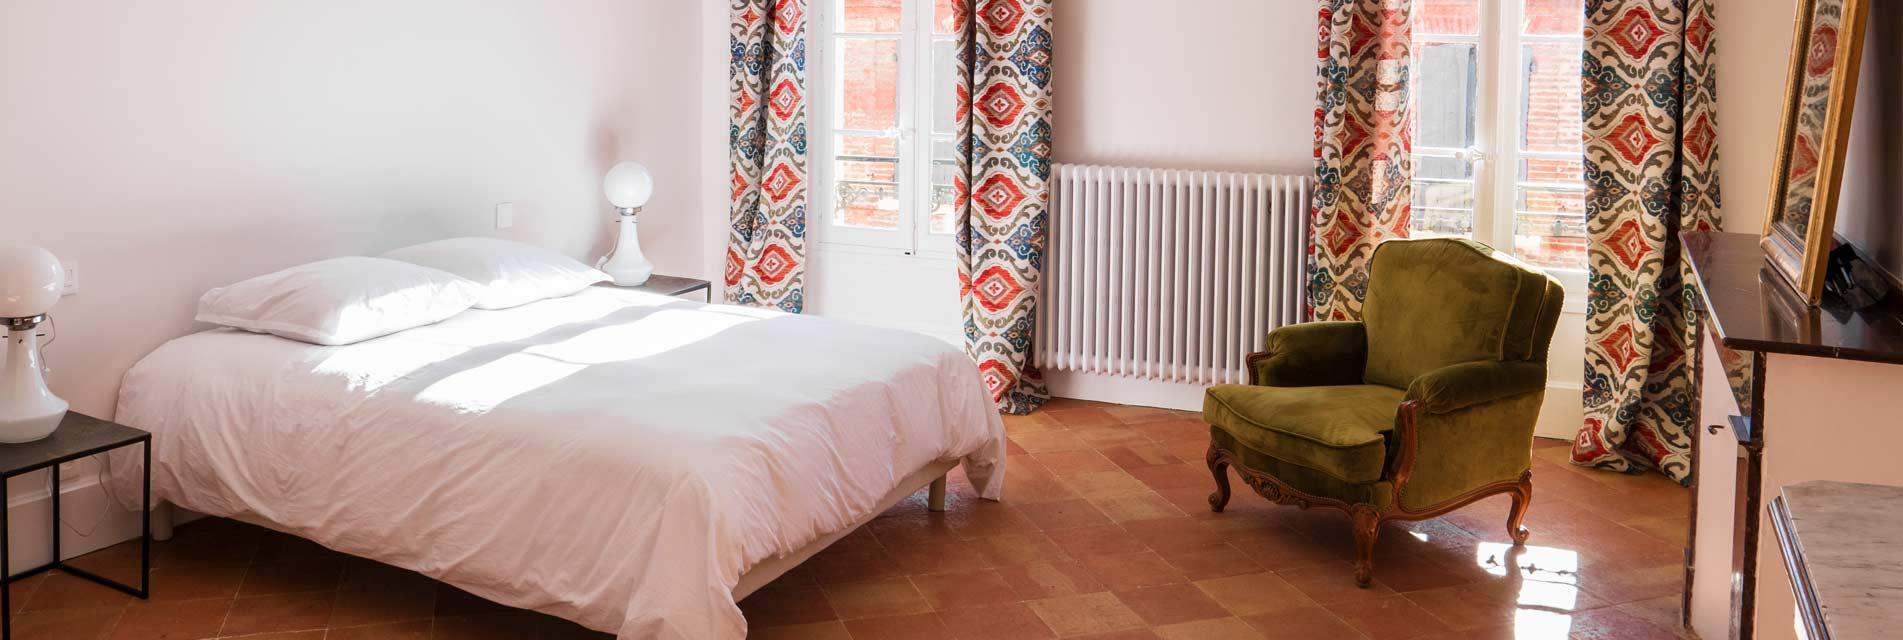 Nos Locations de Vacances en Chambres d'hôtes dans le Tarn en Occitanie